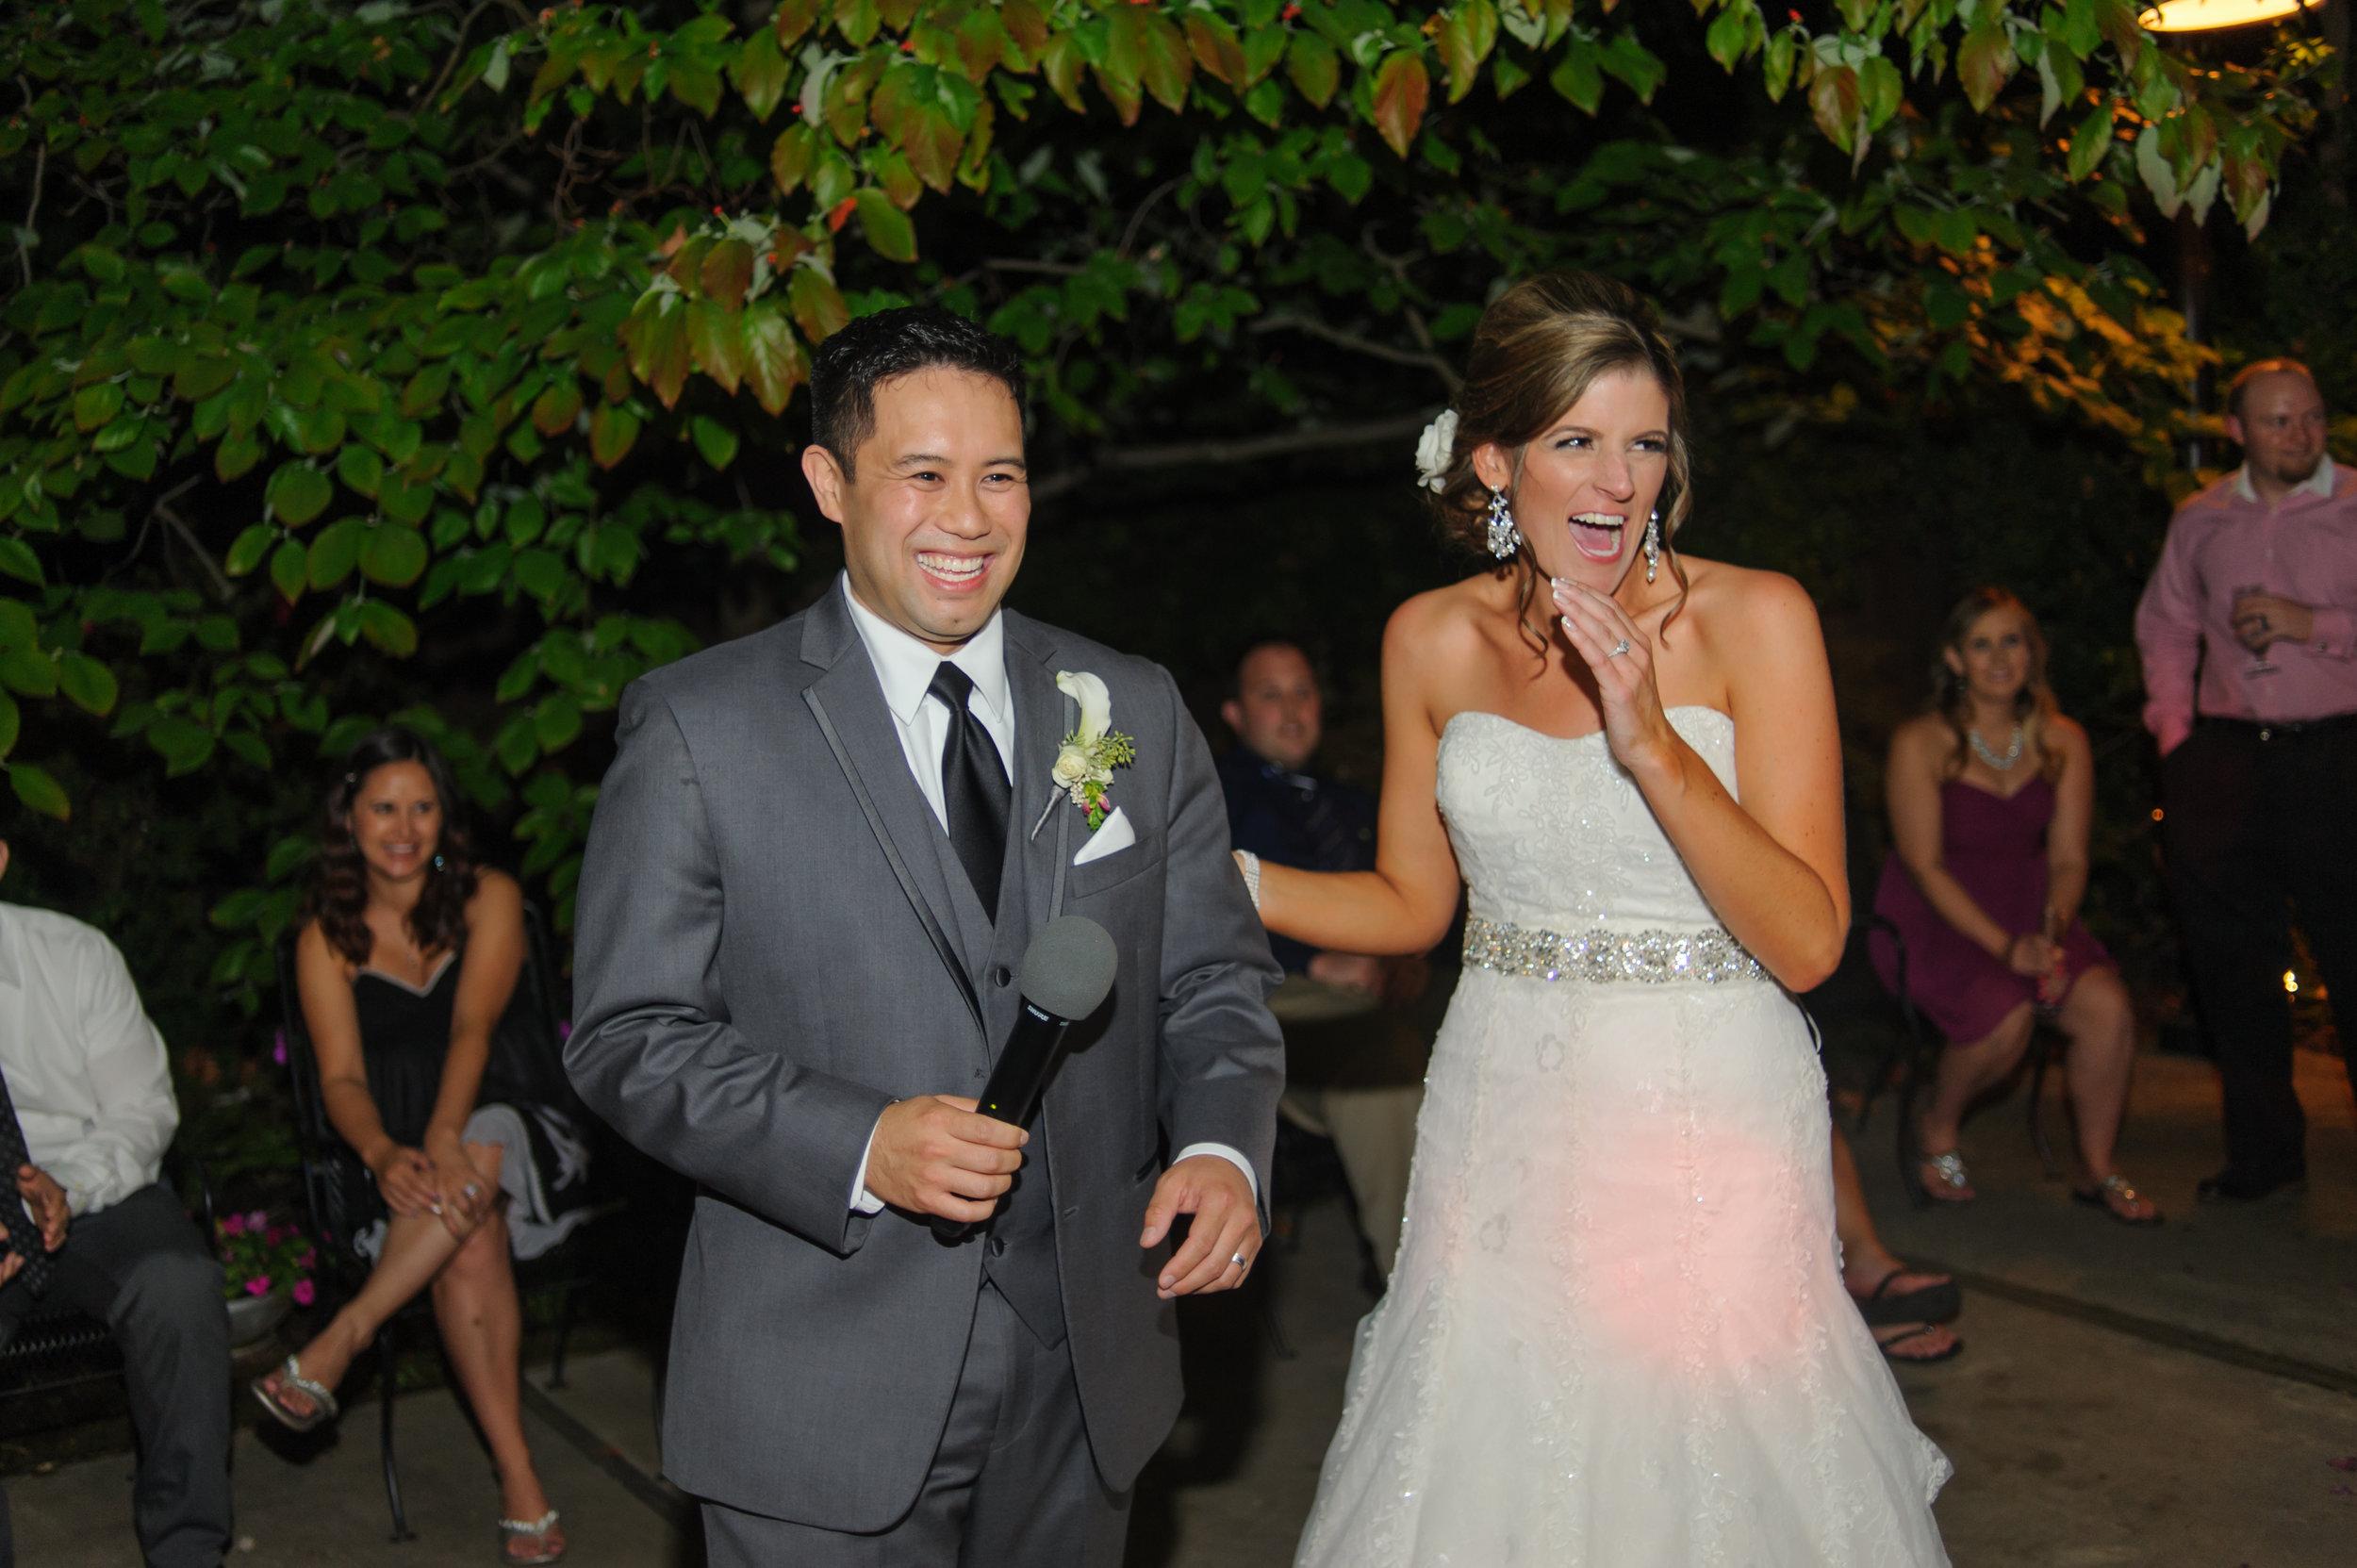 susan-brad-038-sacramento-wedding-photographer-katherine-nicole-photography.JPG